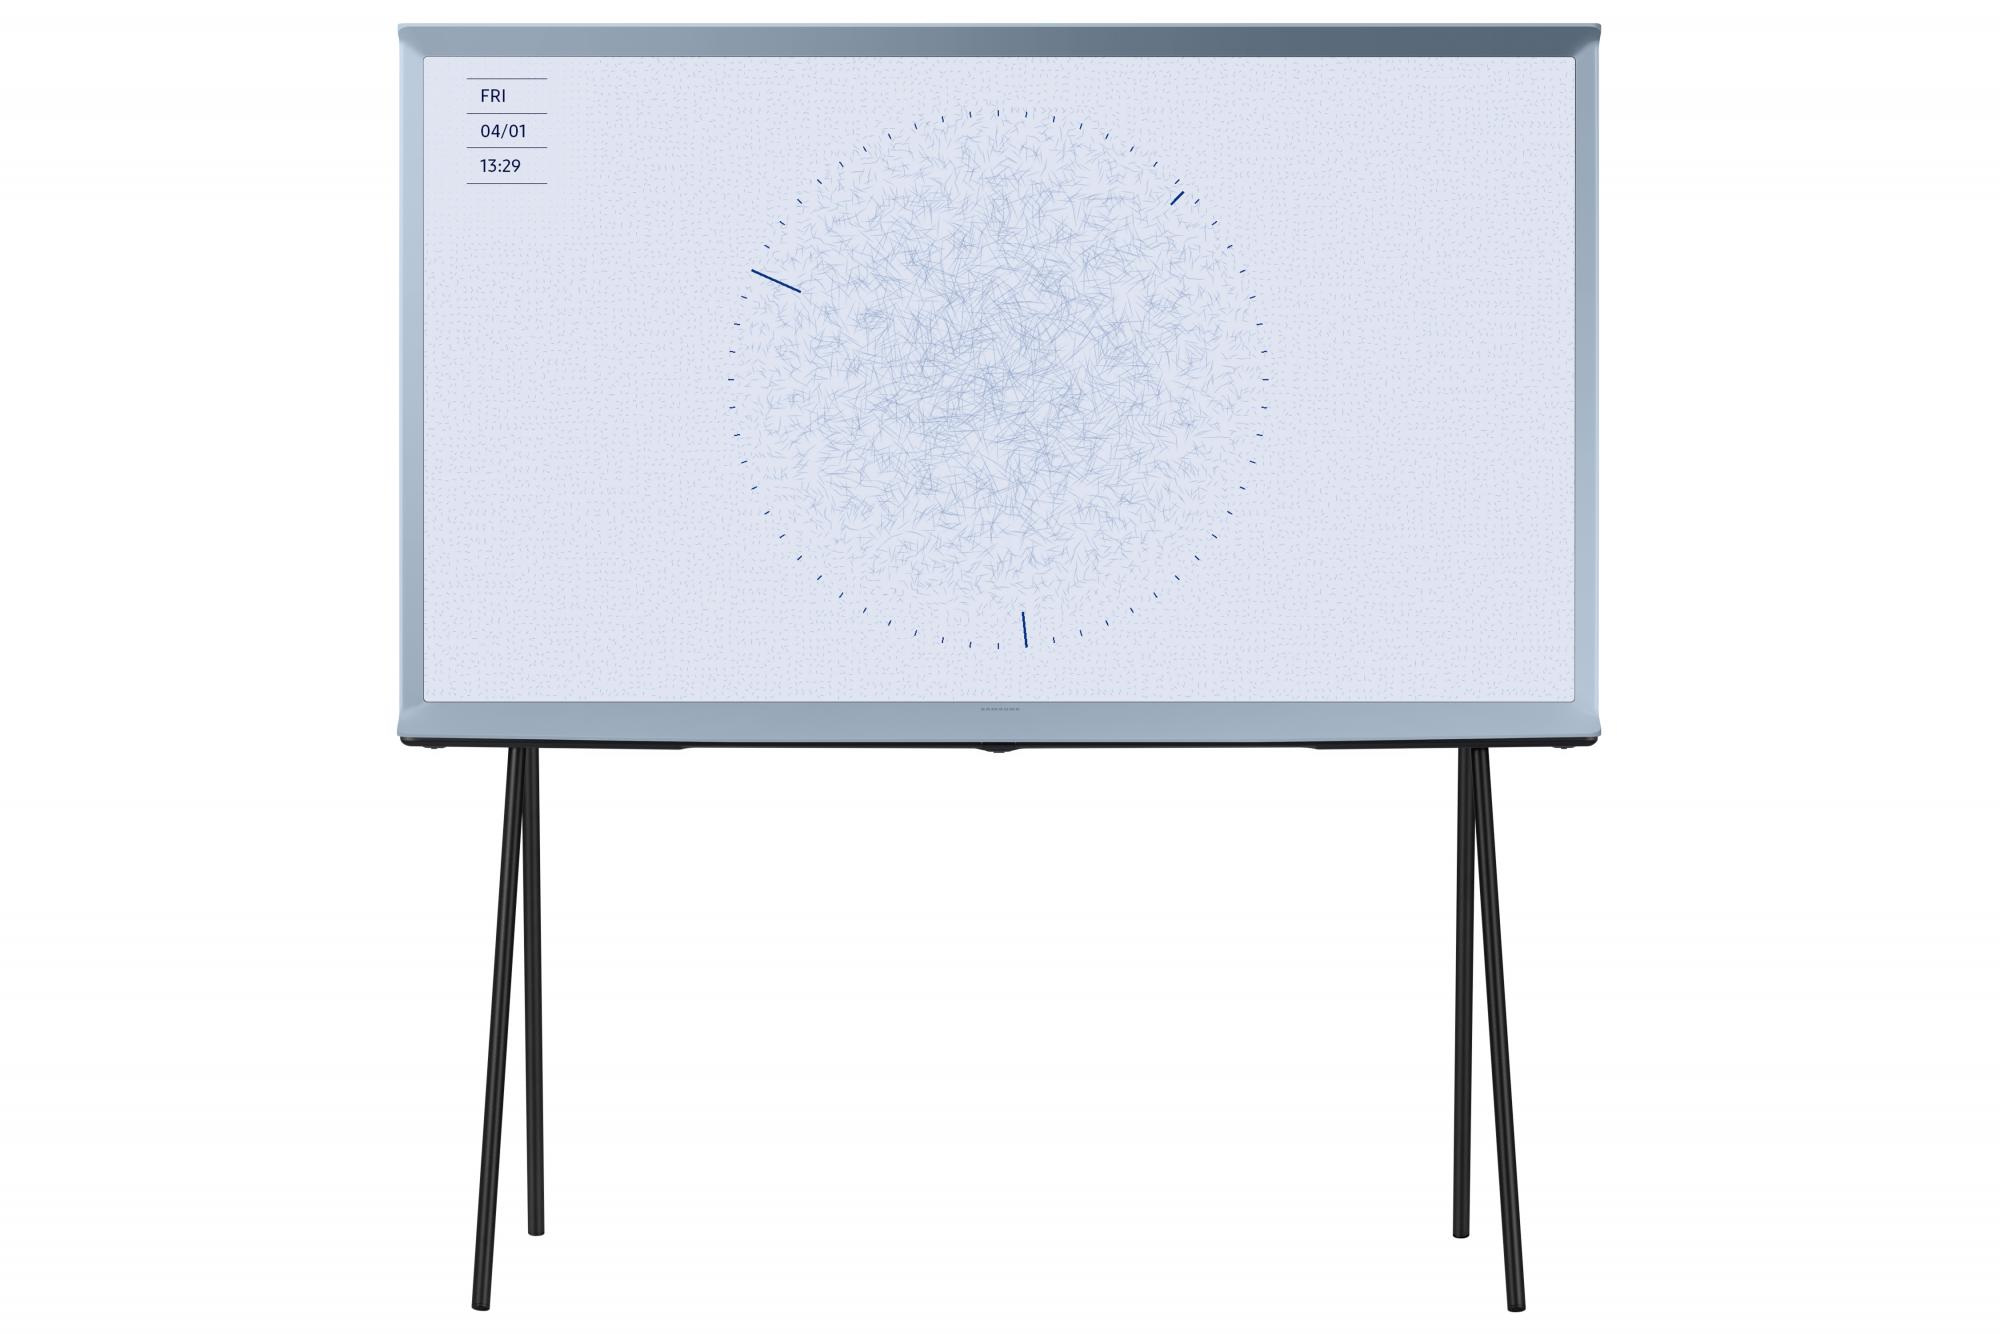 Samsung QE55LS01TB modrý  + 90 dní záruka vrátenia peňazí - QLED 4K TV monitor